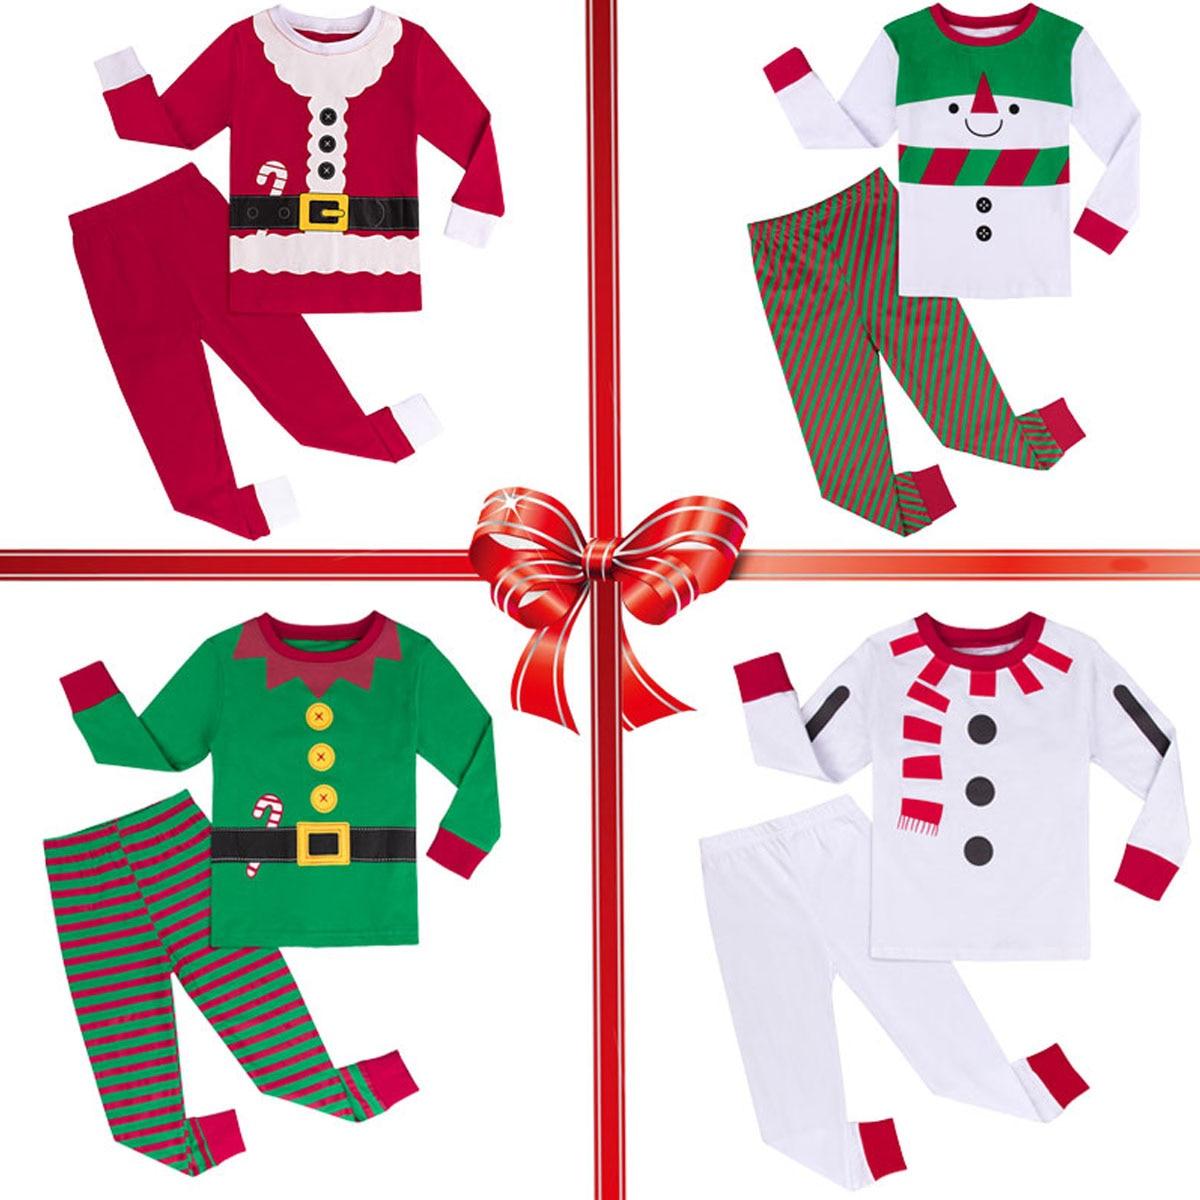 kids Christmas   Pajamas   Toddler Boys Superhero Hulk Spiderman Captain Dinosaur Sleepwear Children Clothing   Set   Avengers Nightwear